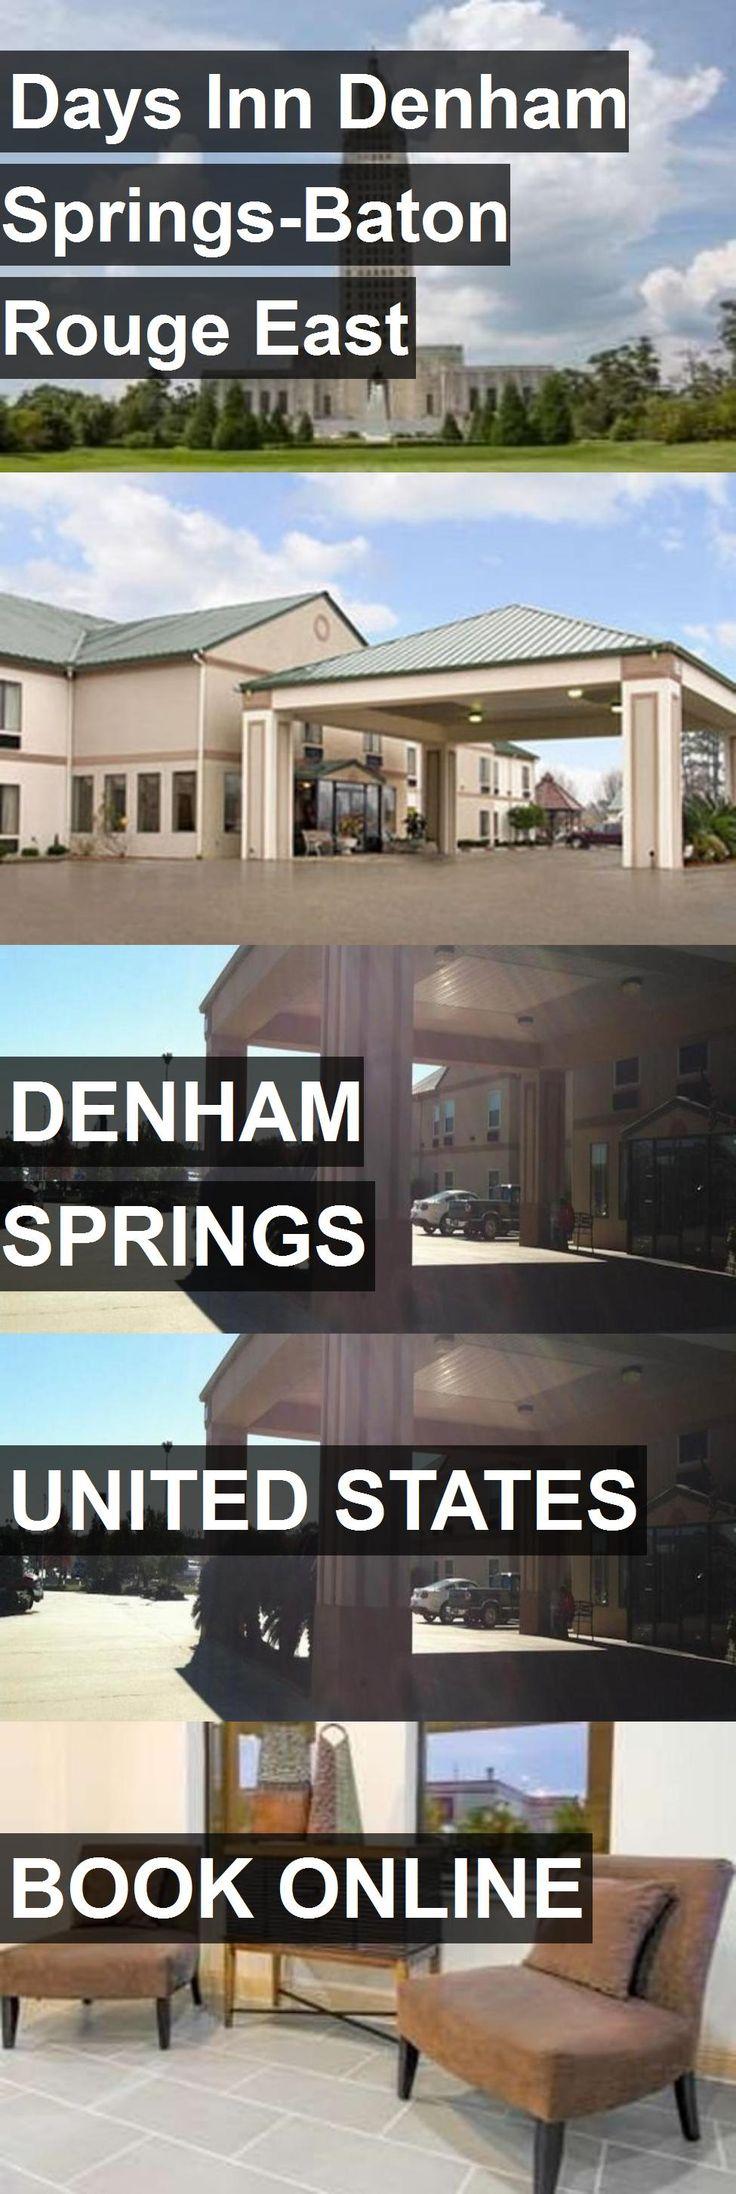 Hotel Days Inn Denham Springs-Baton Rouge East in Denham Springs, United States. For more information, photos, reviews and best prices please follow the link. #UnitedStates #DenhamSprings #DaysInnDenhamSprings-BatonRougeEast #hotel #travel #vacation